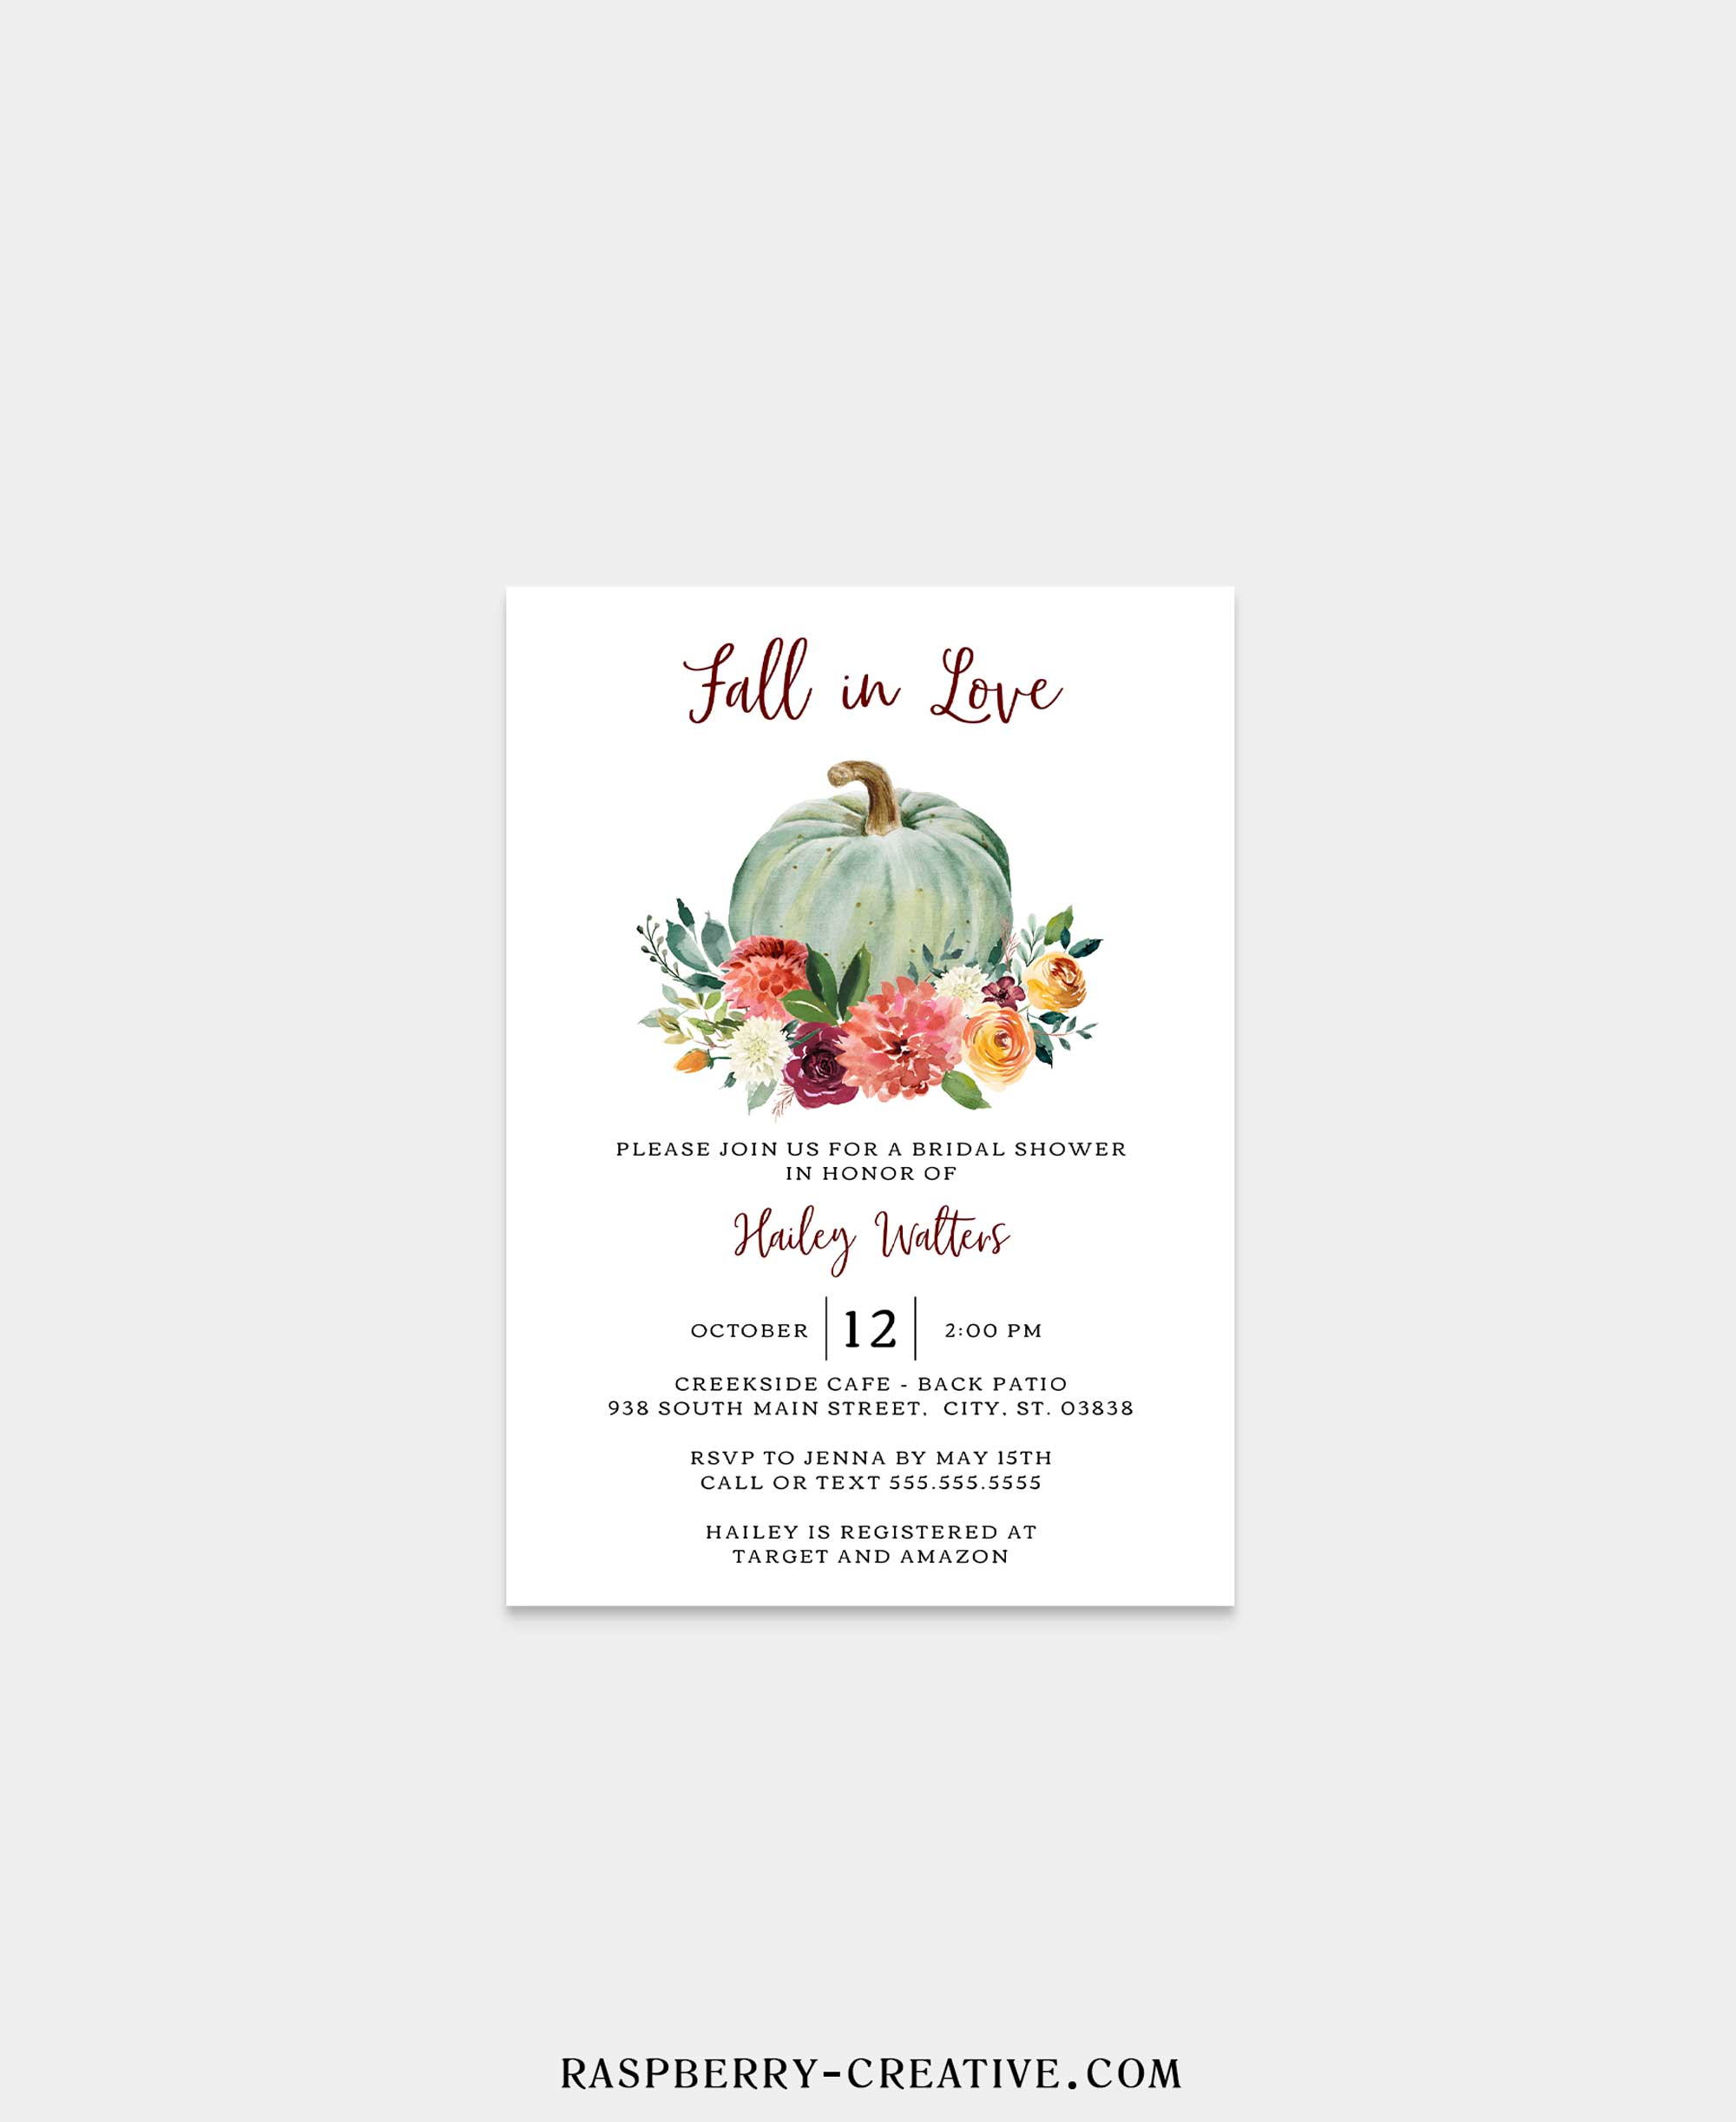 Spicey Pumpkin Fall in Love Bridal Shower Invitation